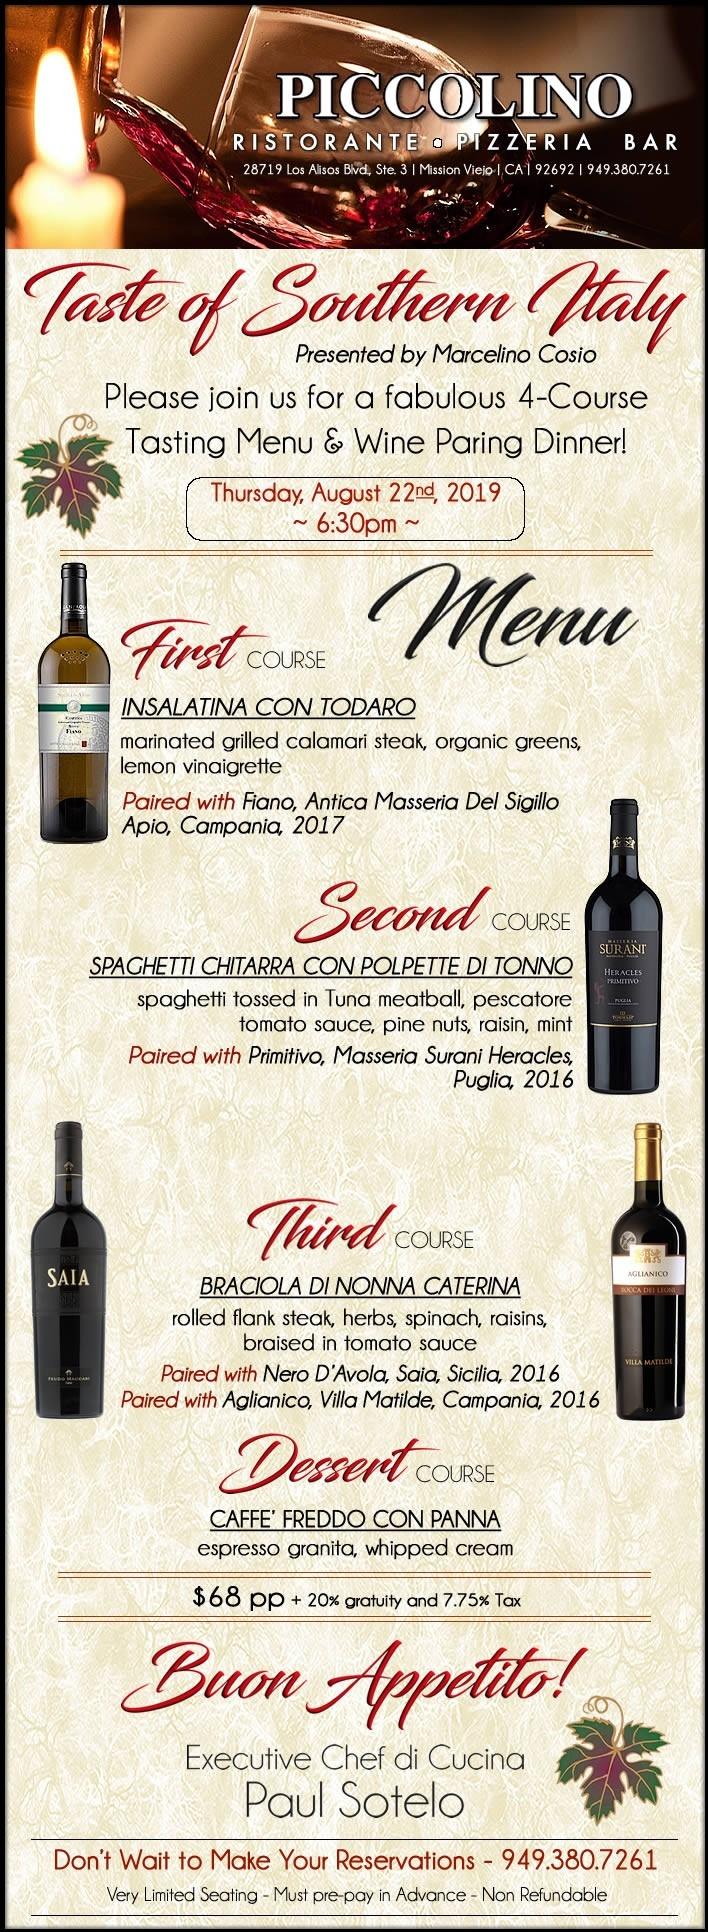 Piccolino Ristorante - Southern Italian Wine-Pairing Dinner - Thursday - Aug 22nd